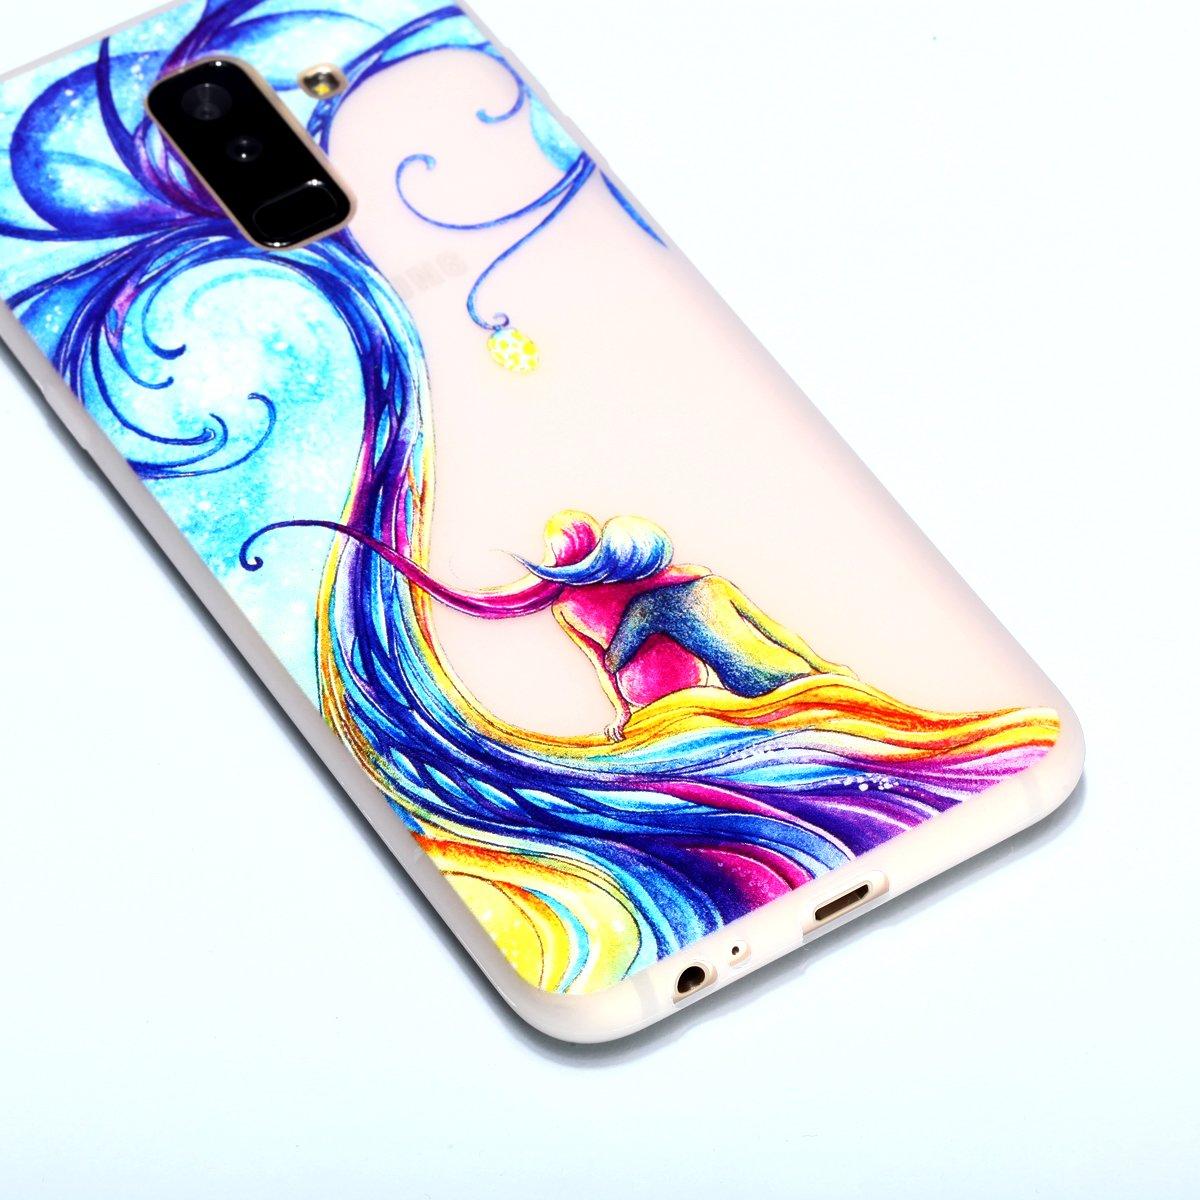 Cerf Sika Slim Etui Noctilucent Coque TPU pour Samsung Galaxy A6 Plus 2018 Coque Carols Coque Samsung Galaxy A6 Plus 2018